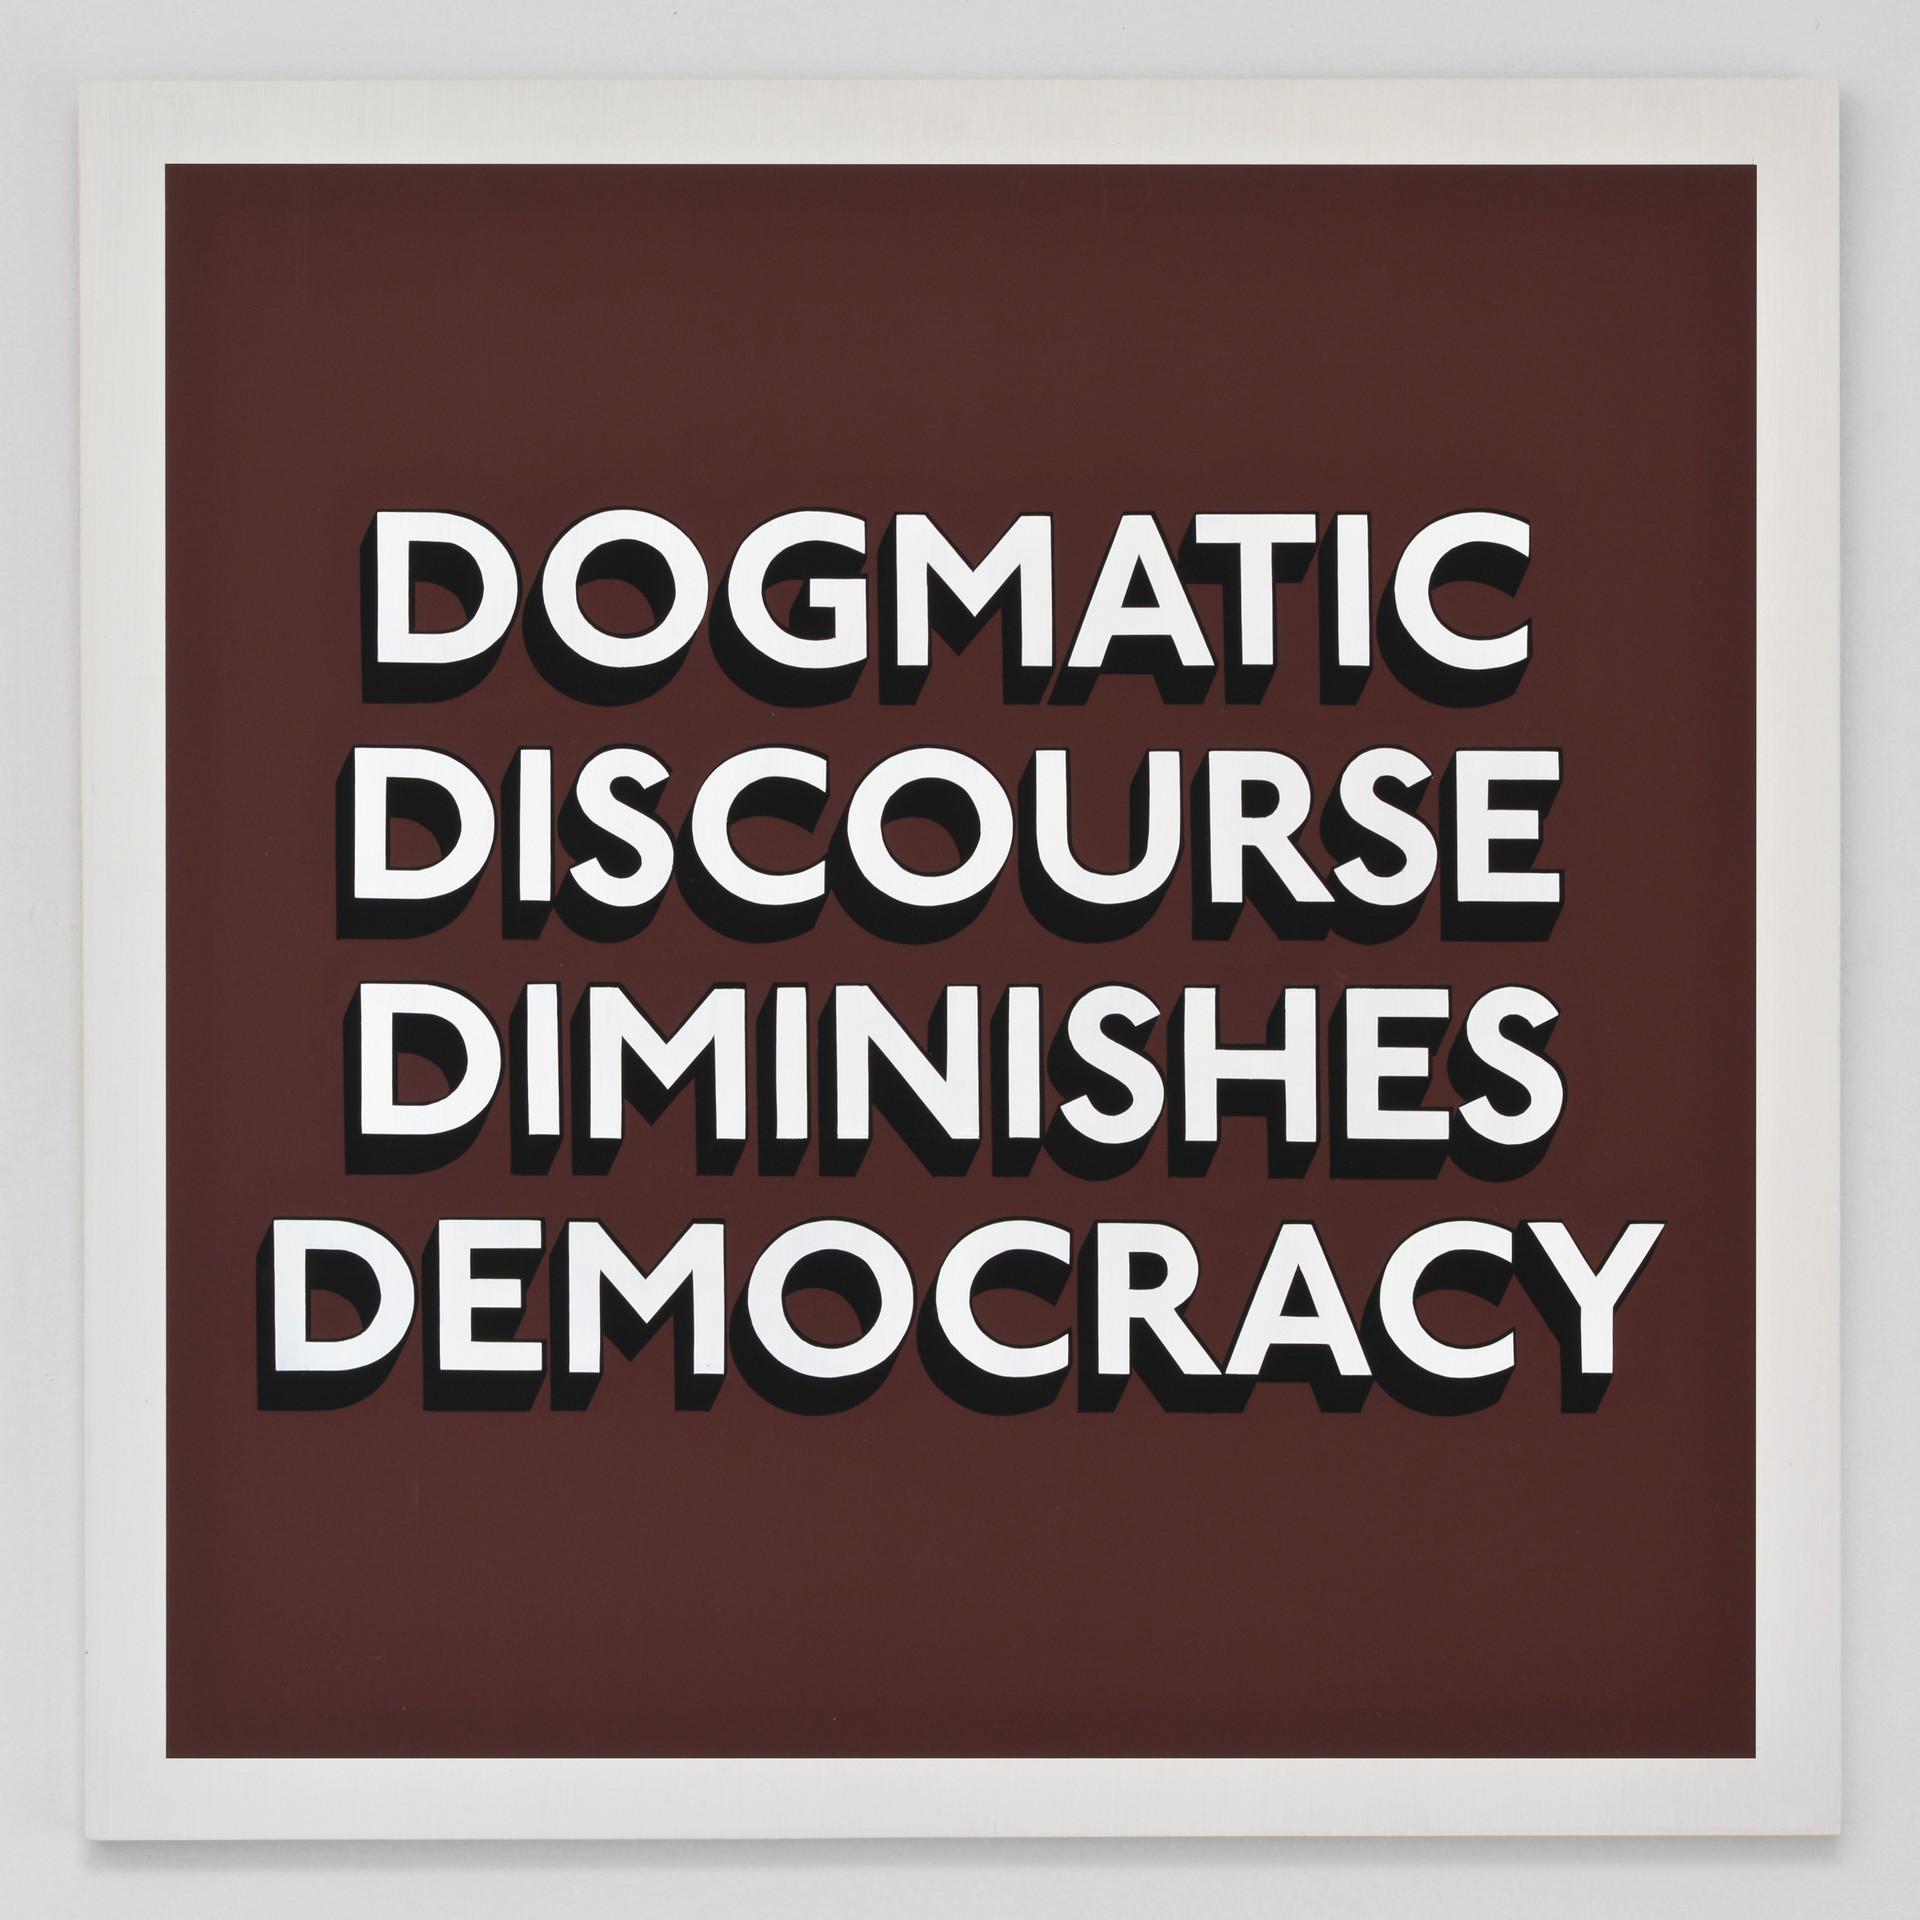 DOGMATIC_DISCOURSE.jpg